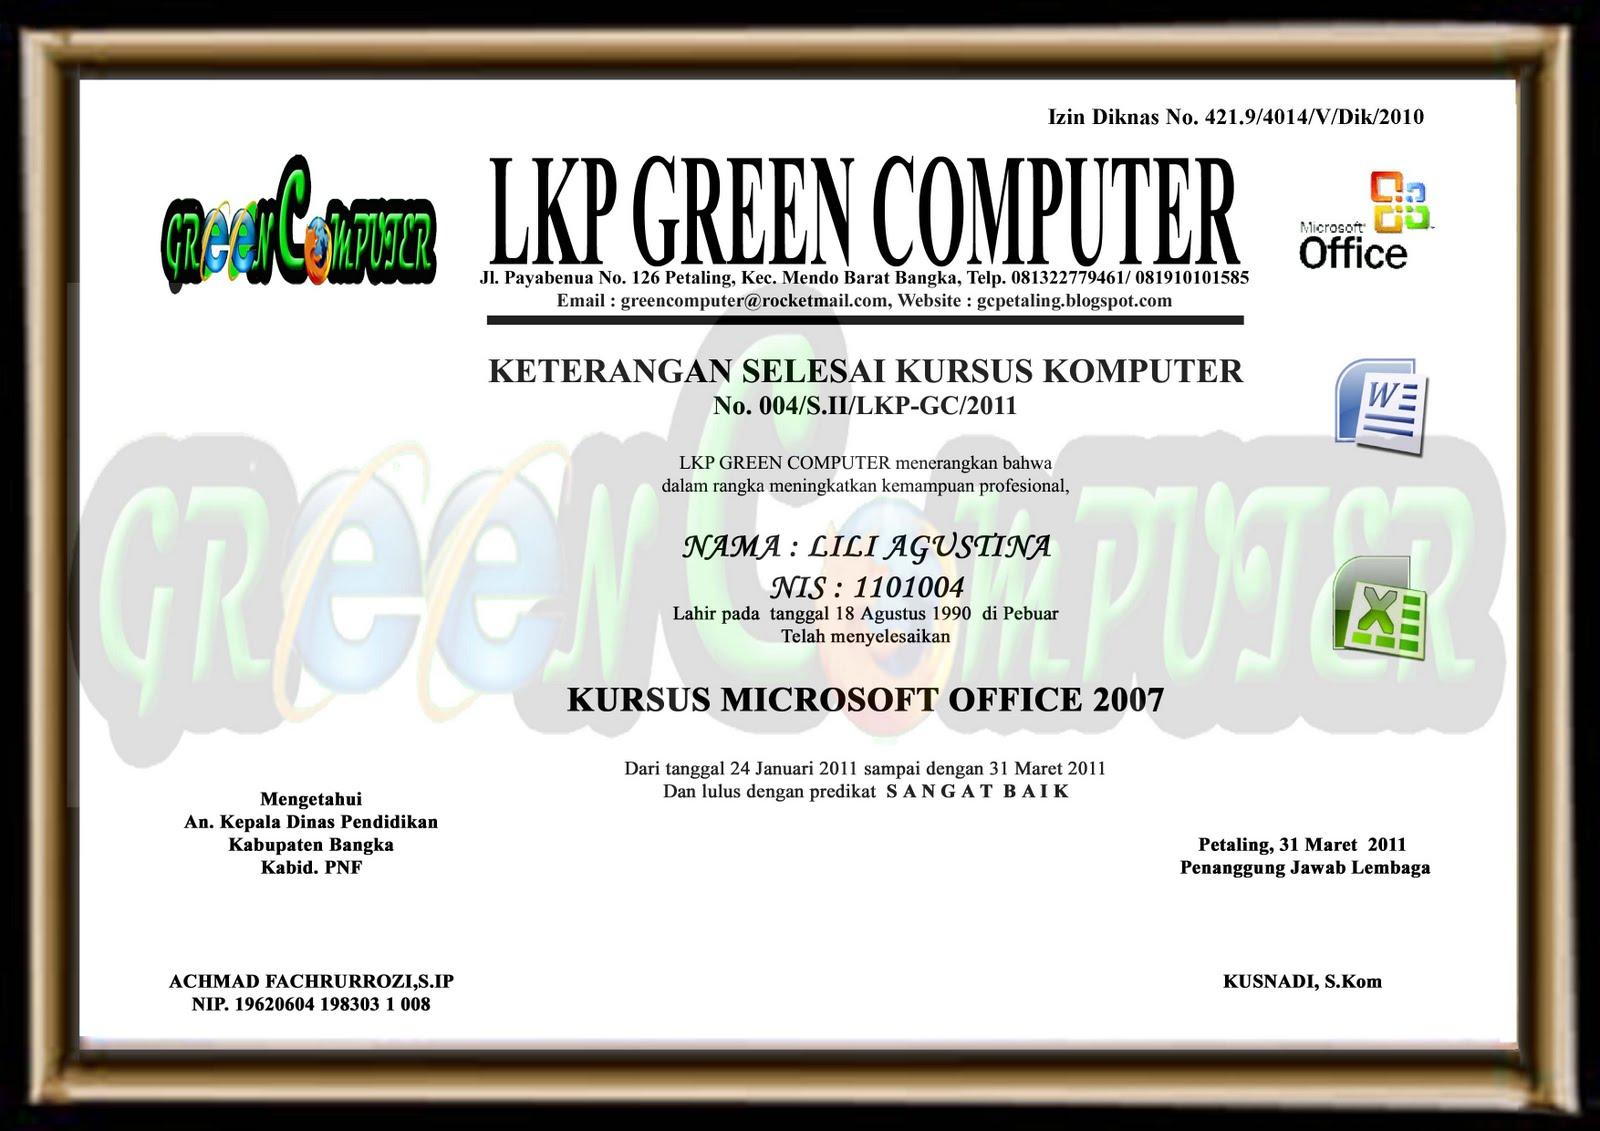 LKP GREEN COMPUTER Galery